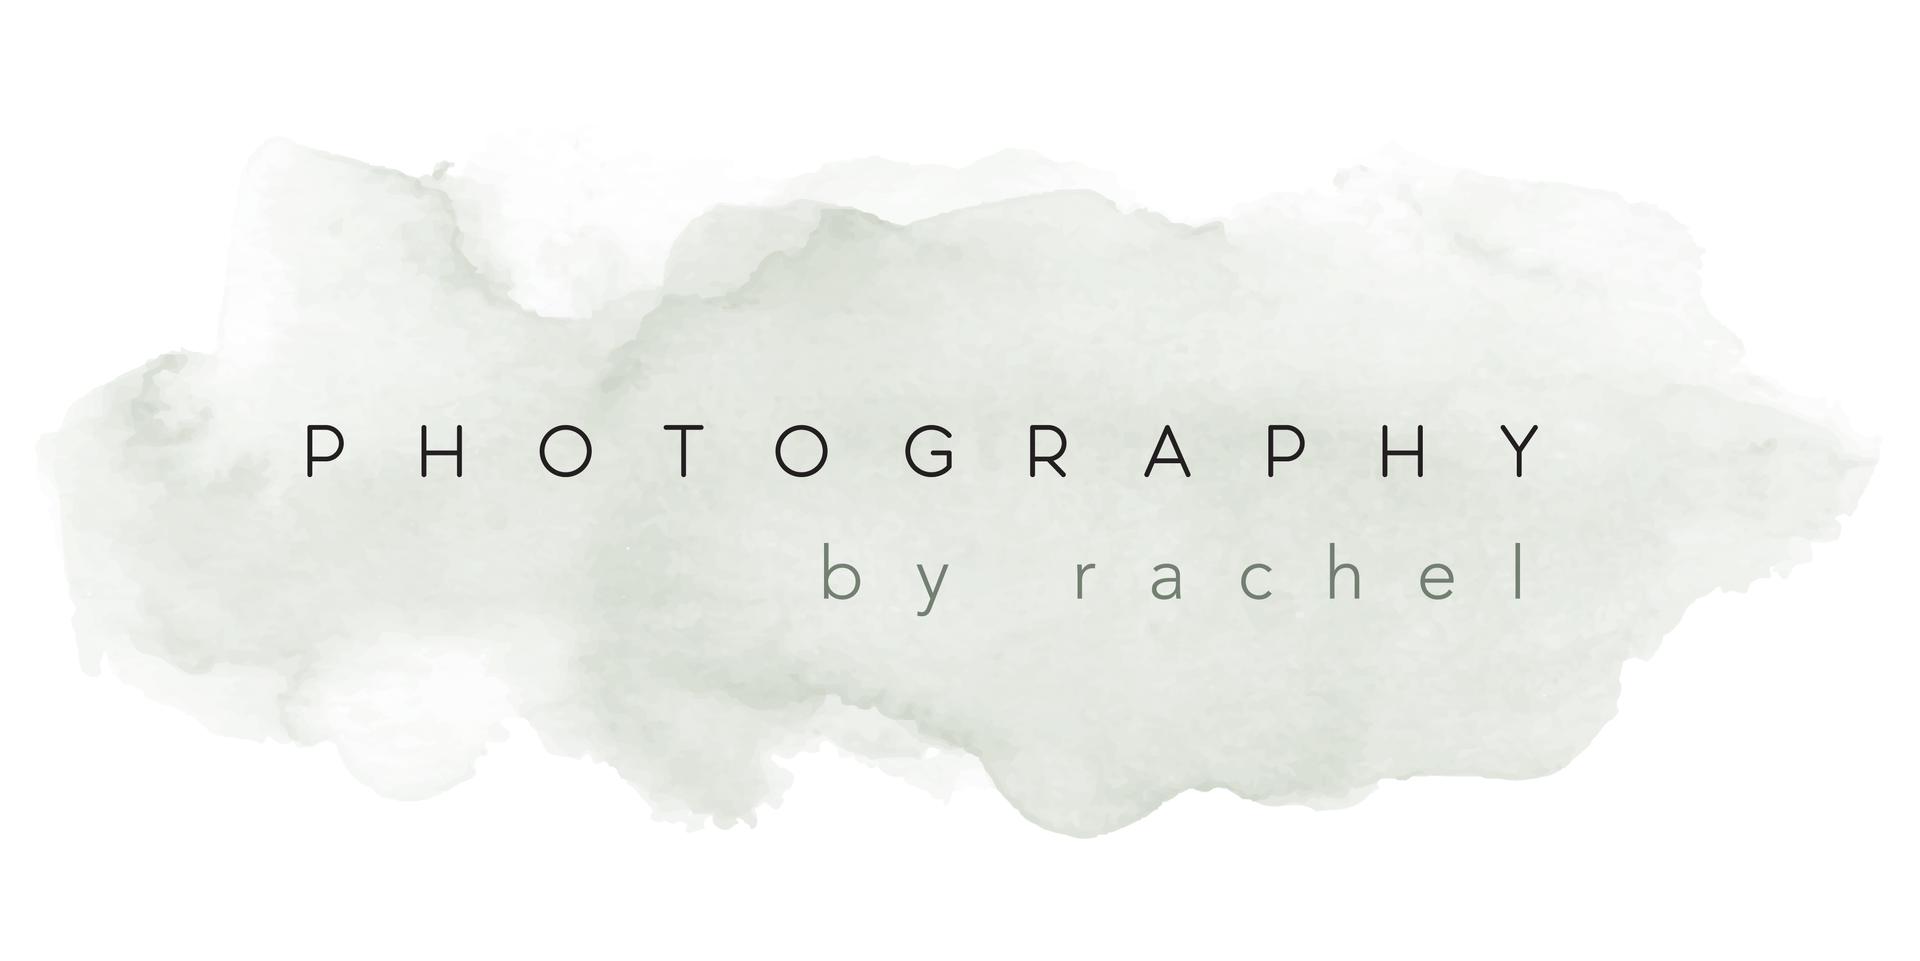 Photography by Rachel Branding | Brand Identity Design by Fresh Leaf Creative